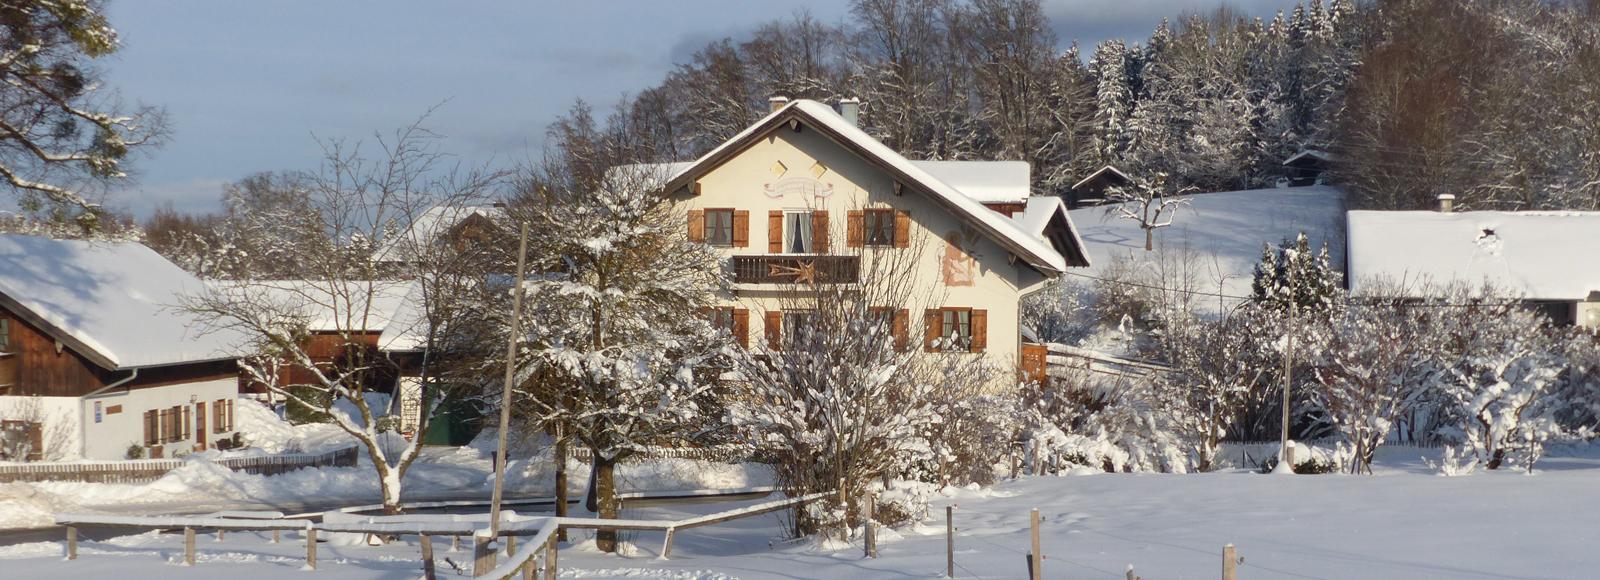 Mesnerhof im Winter